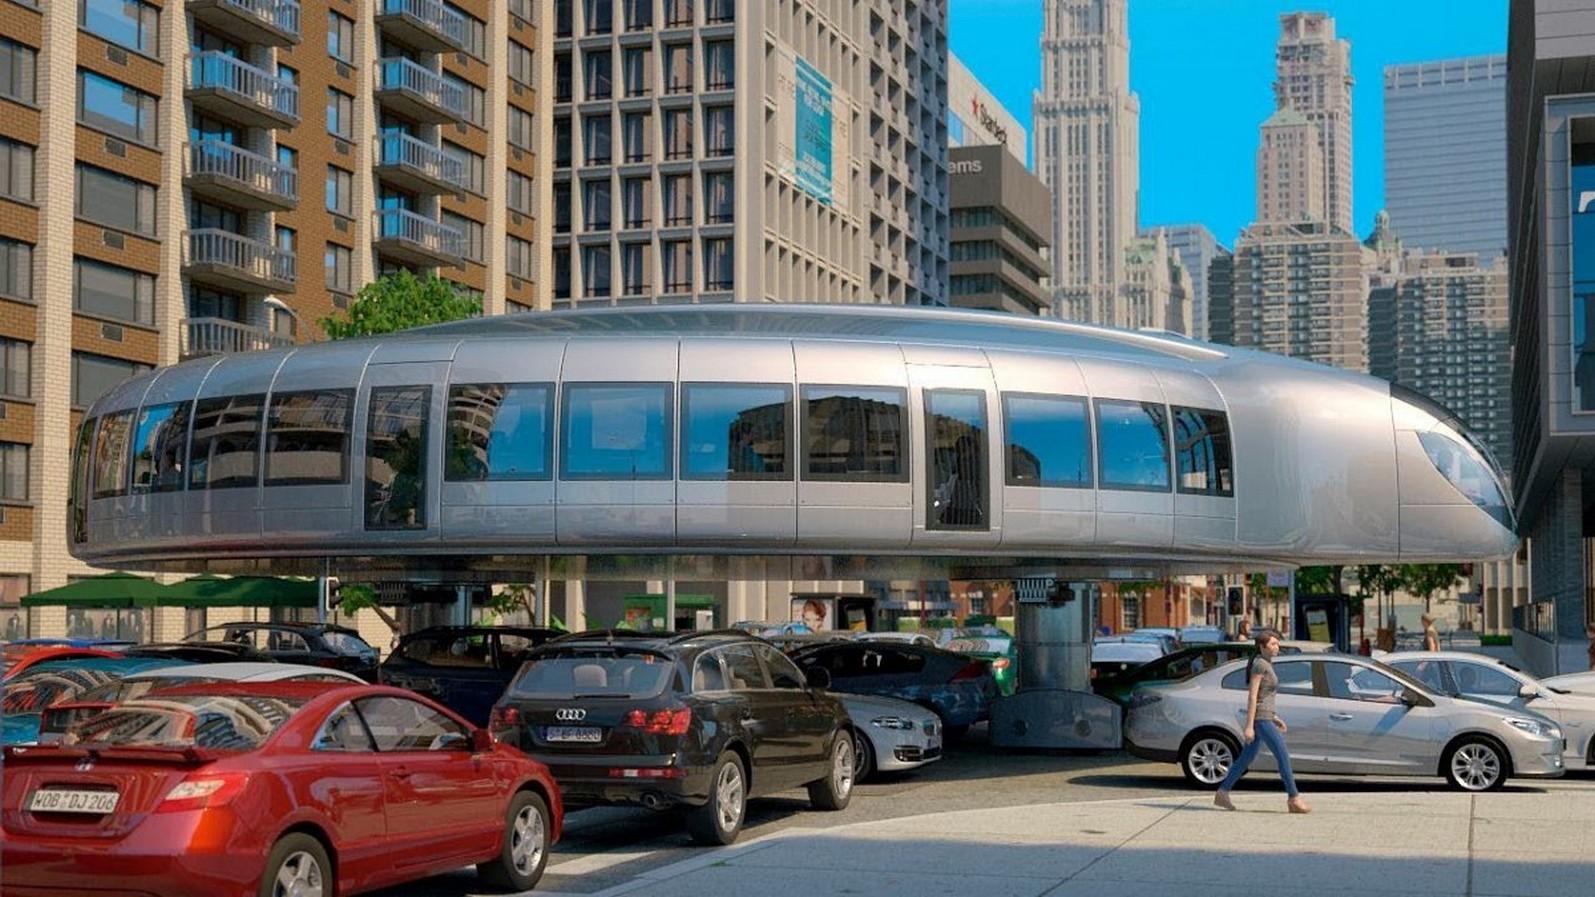 20 Futuristic projects in transportation design - Sheet13